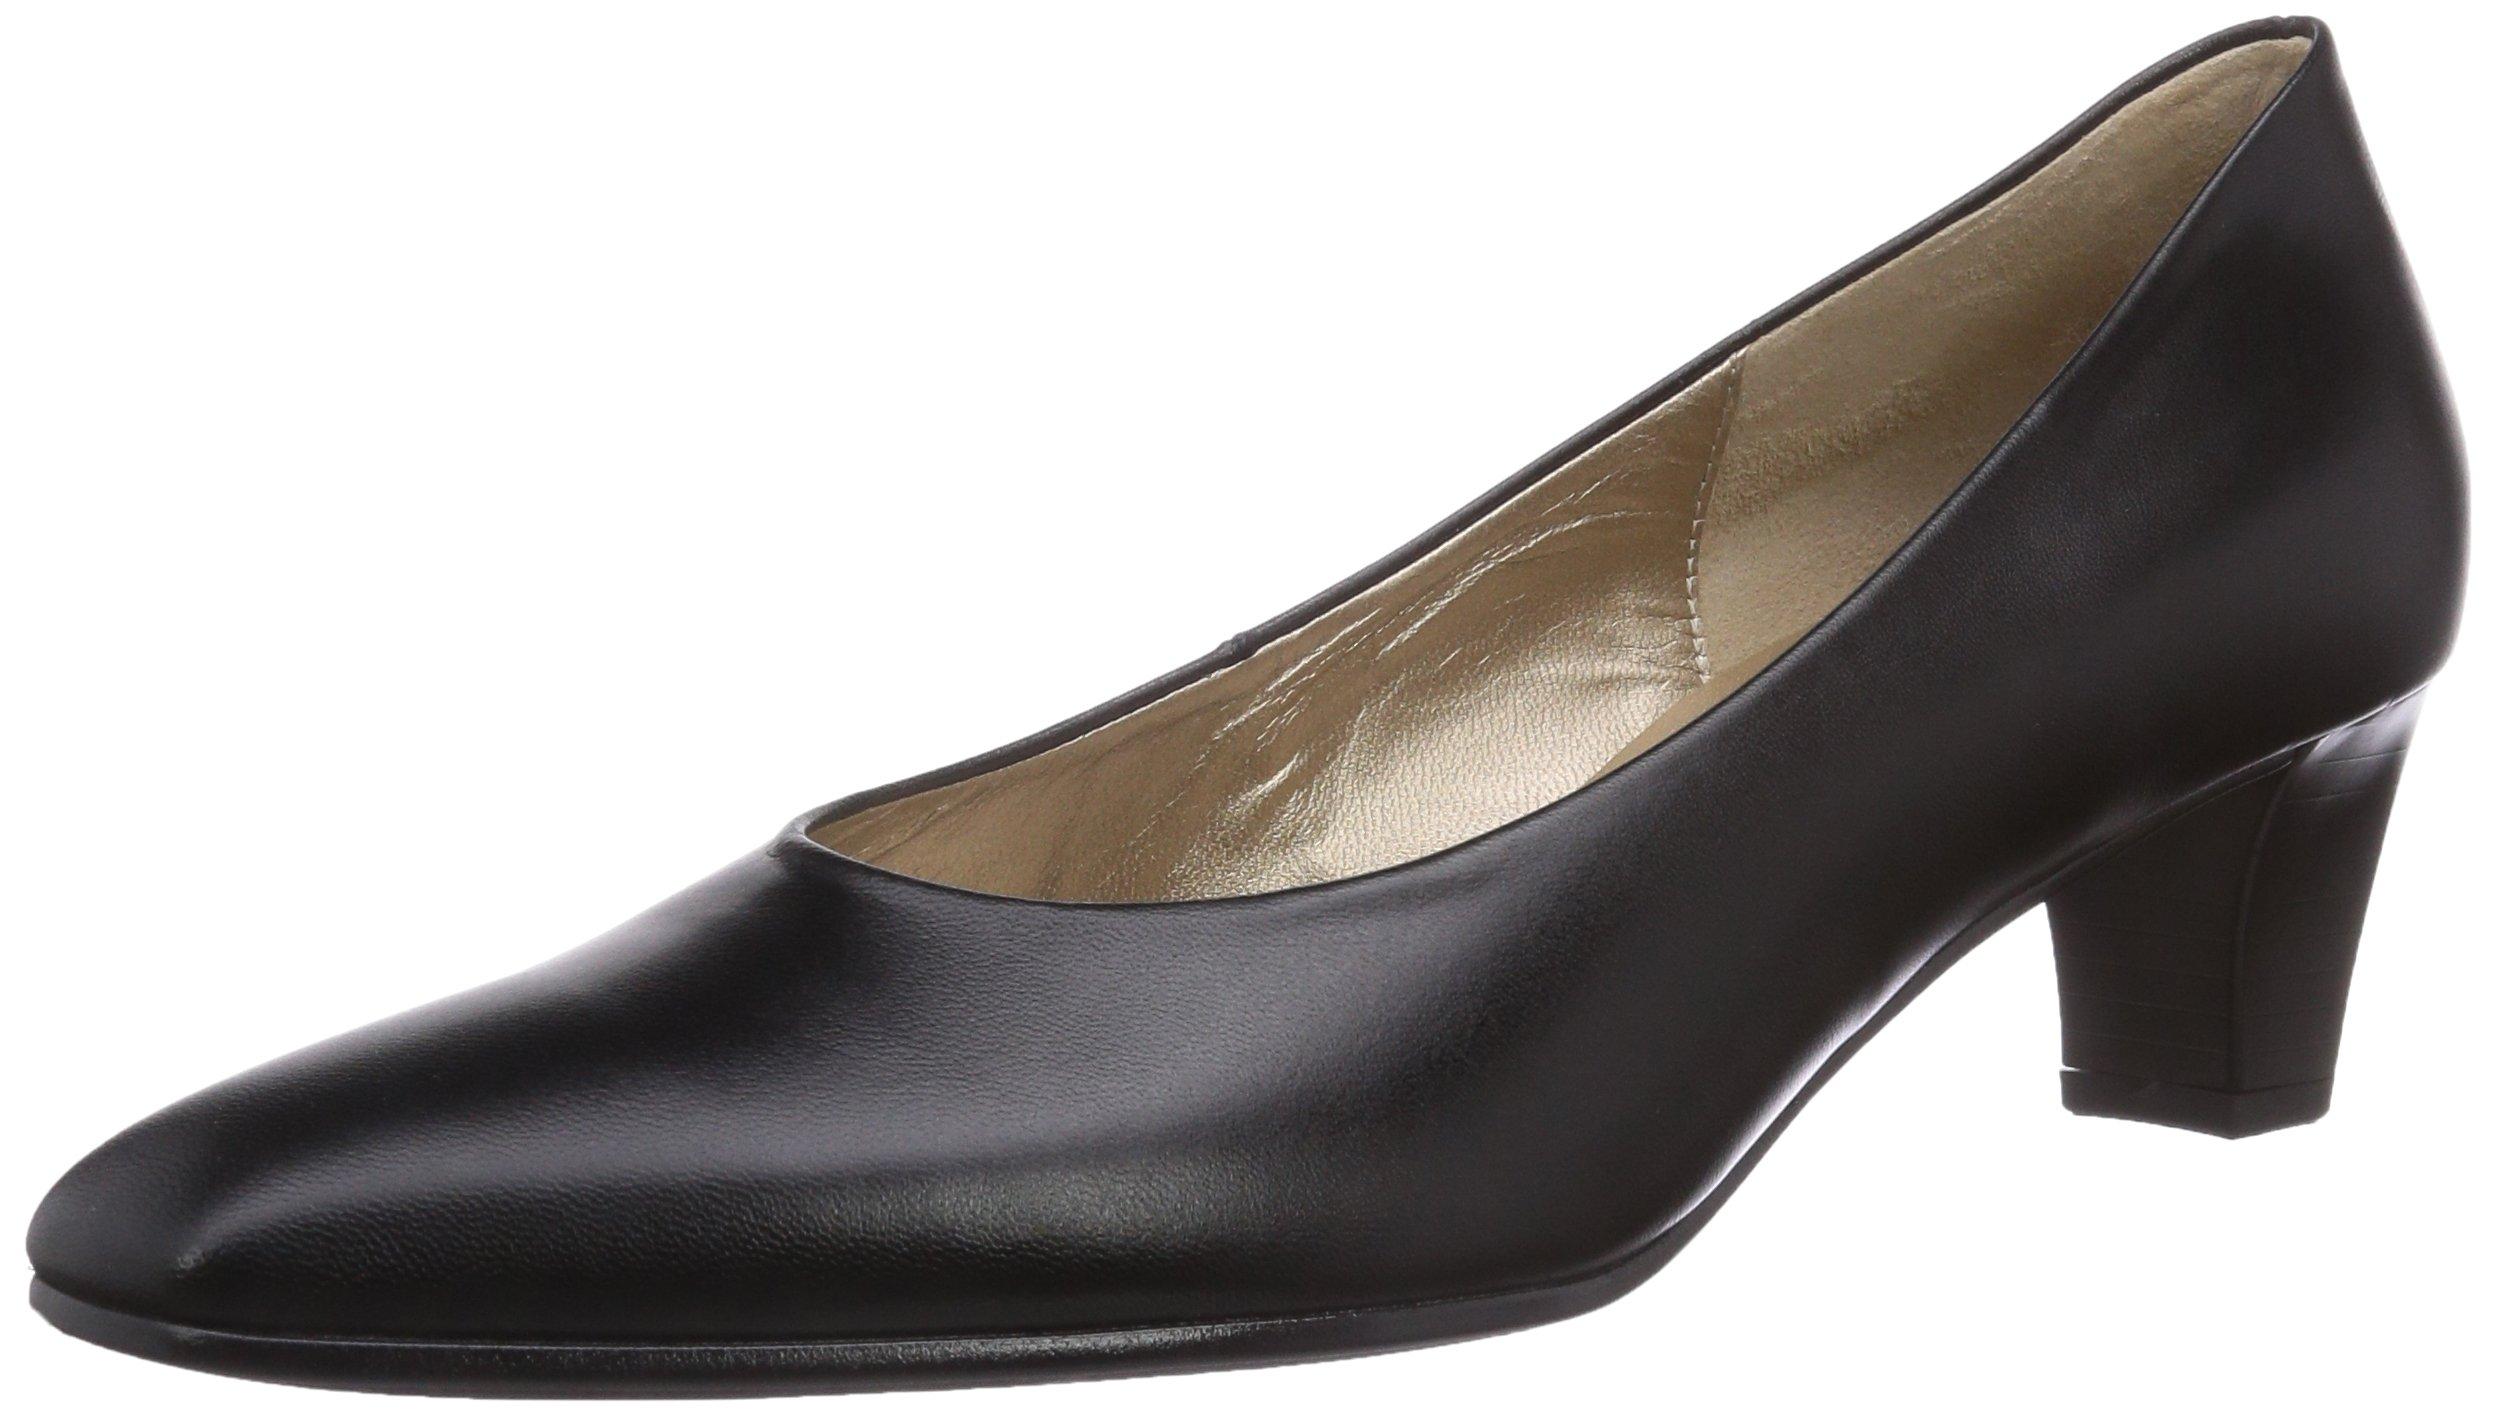 Gabor Uk Leather44 Shoes CompetitionEscarpins 5 FemmeNoirblack Eu9 yvmnO80Nw